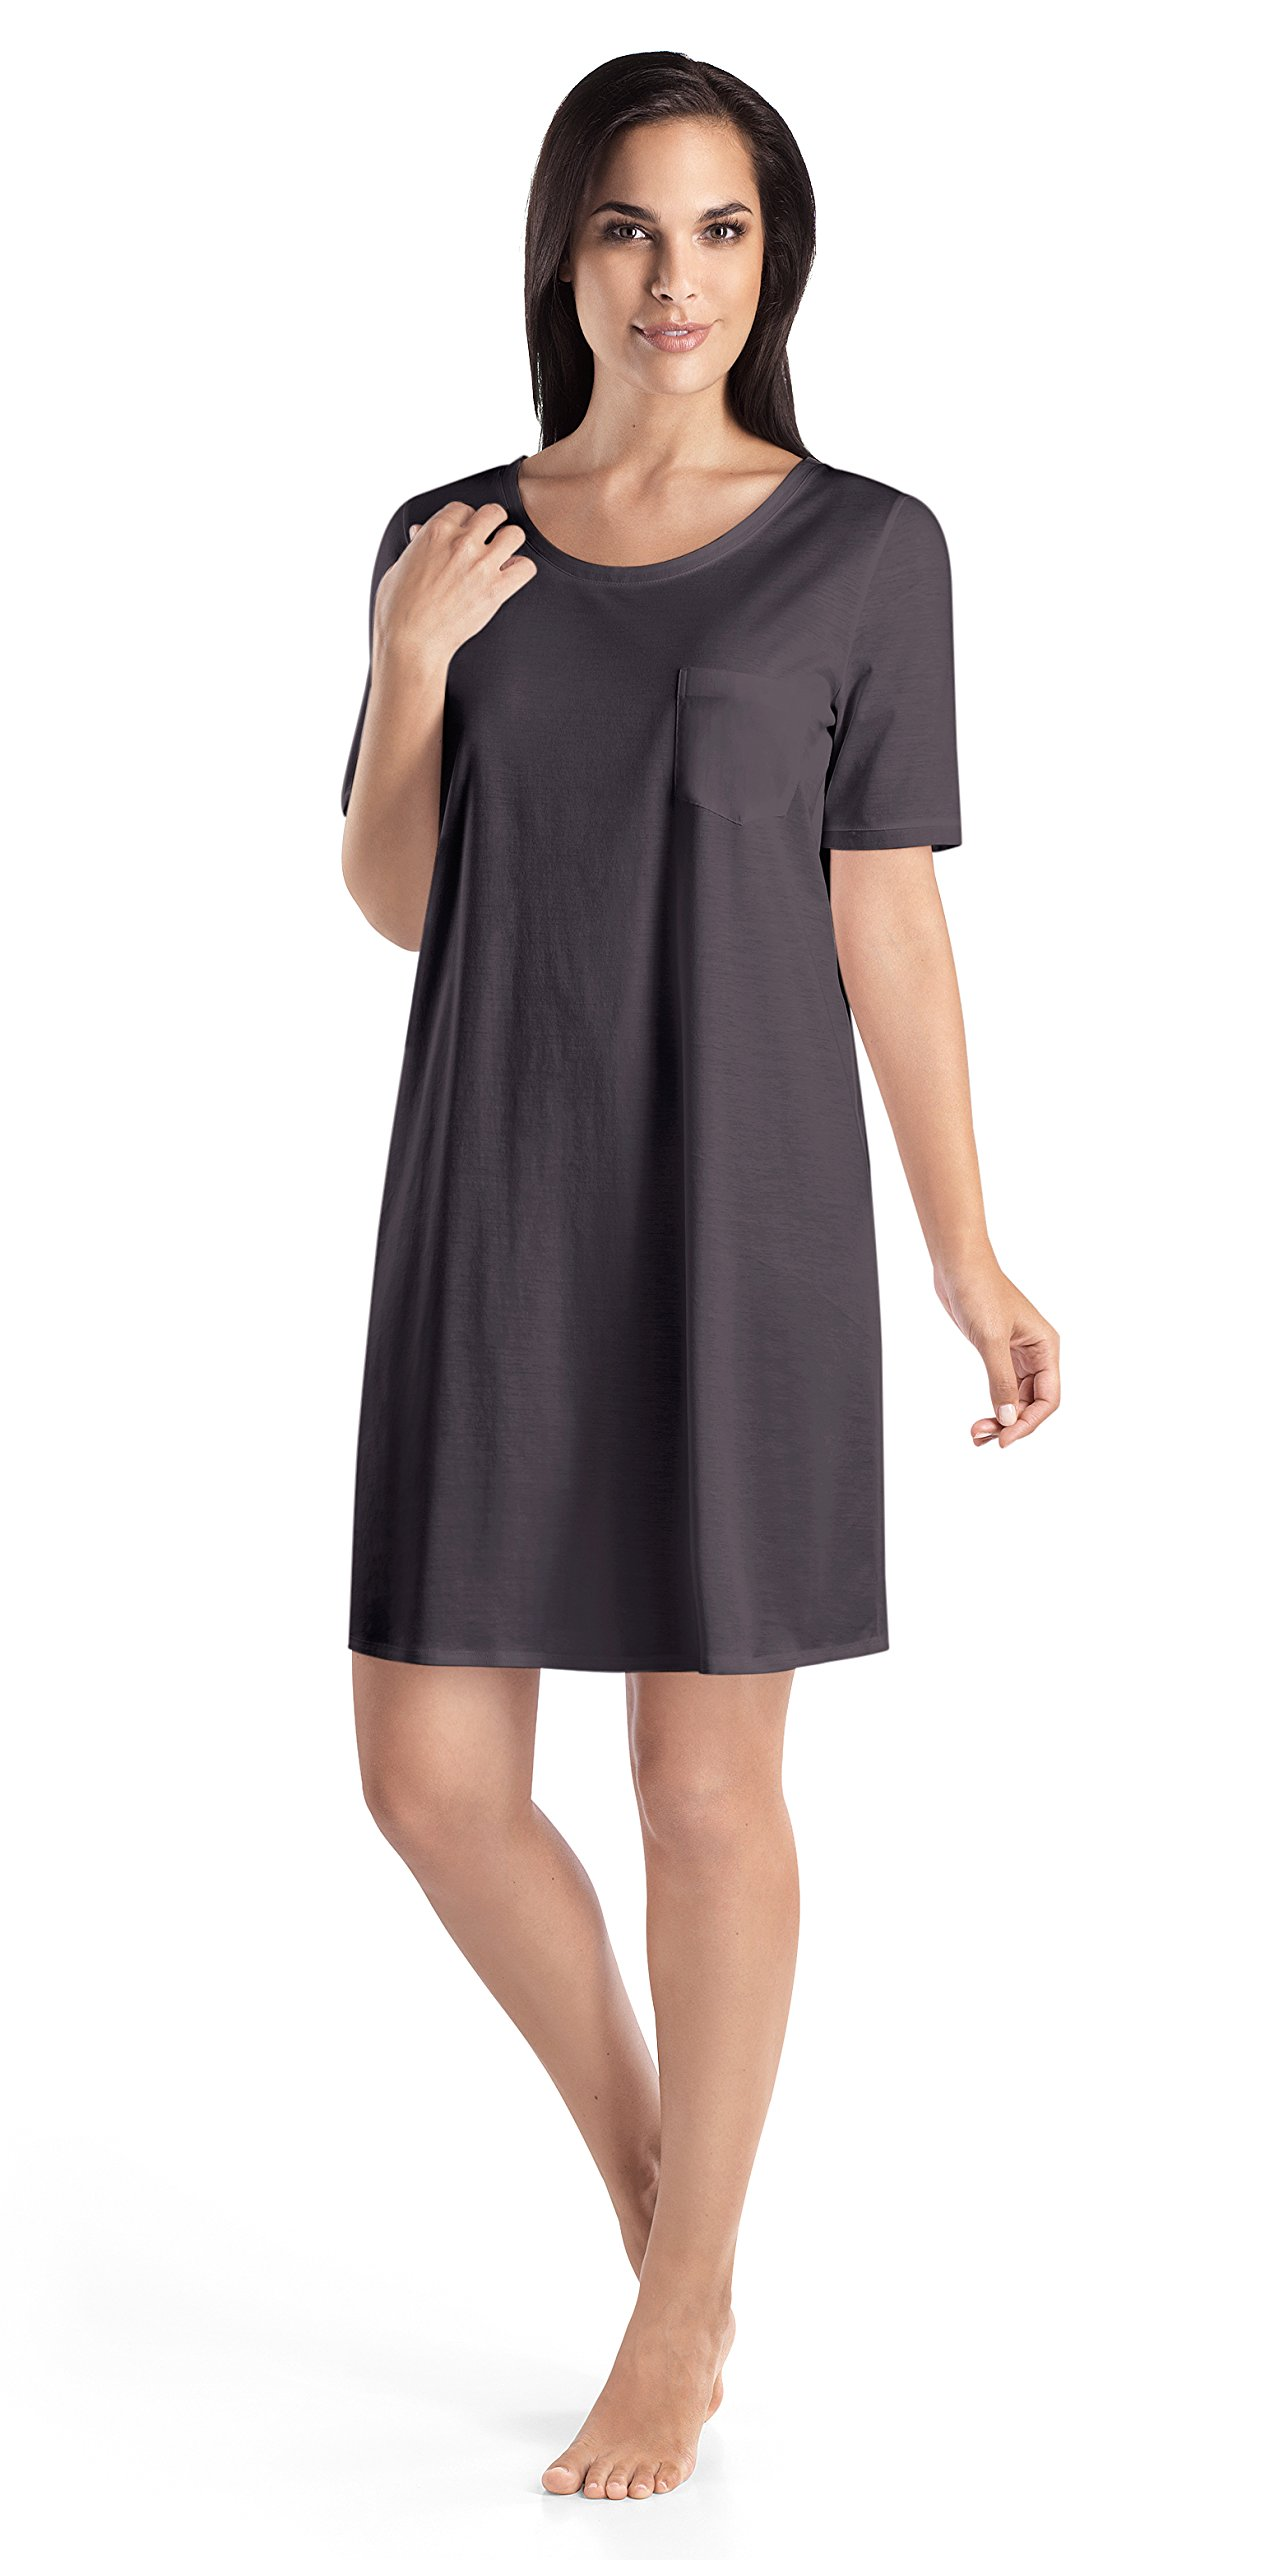 Hanro Women's Cotton Deluxe Short Sleeve Bigshirt, Carbon, Large